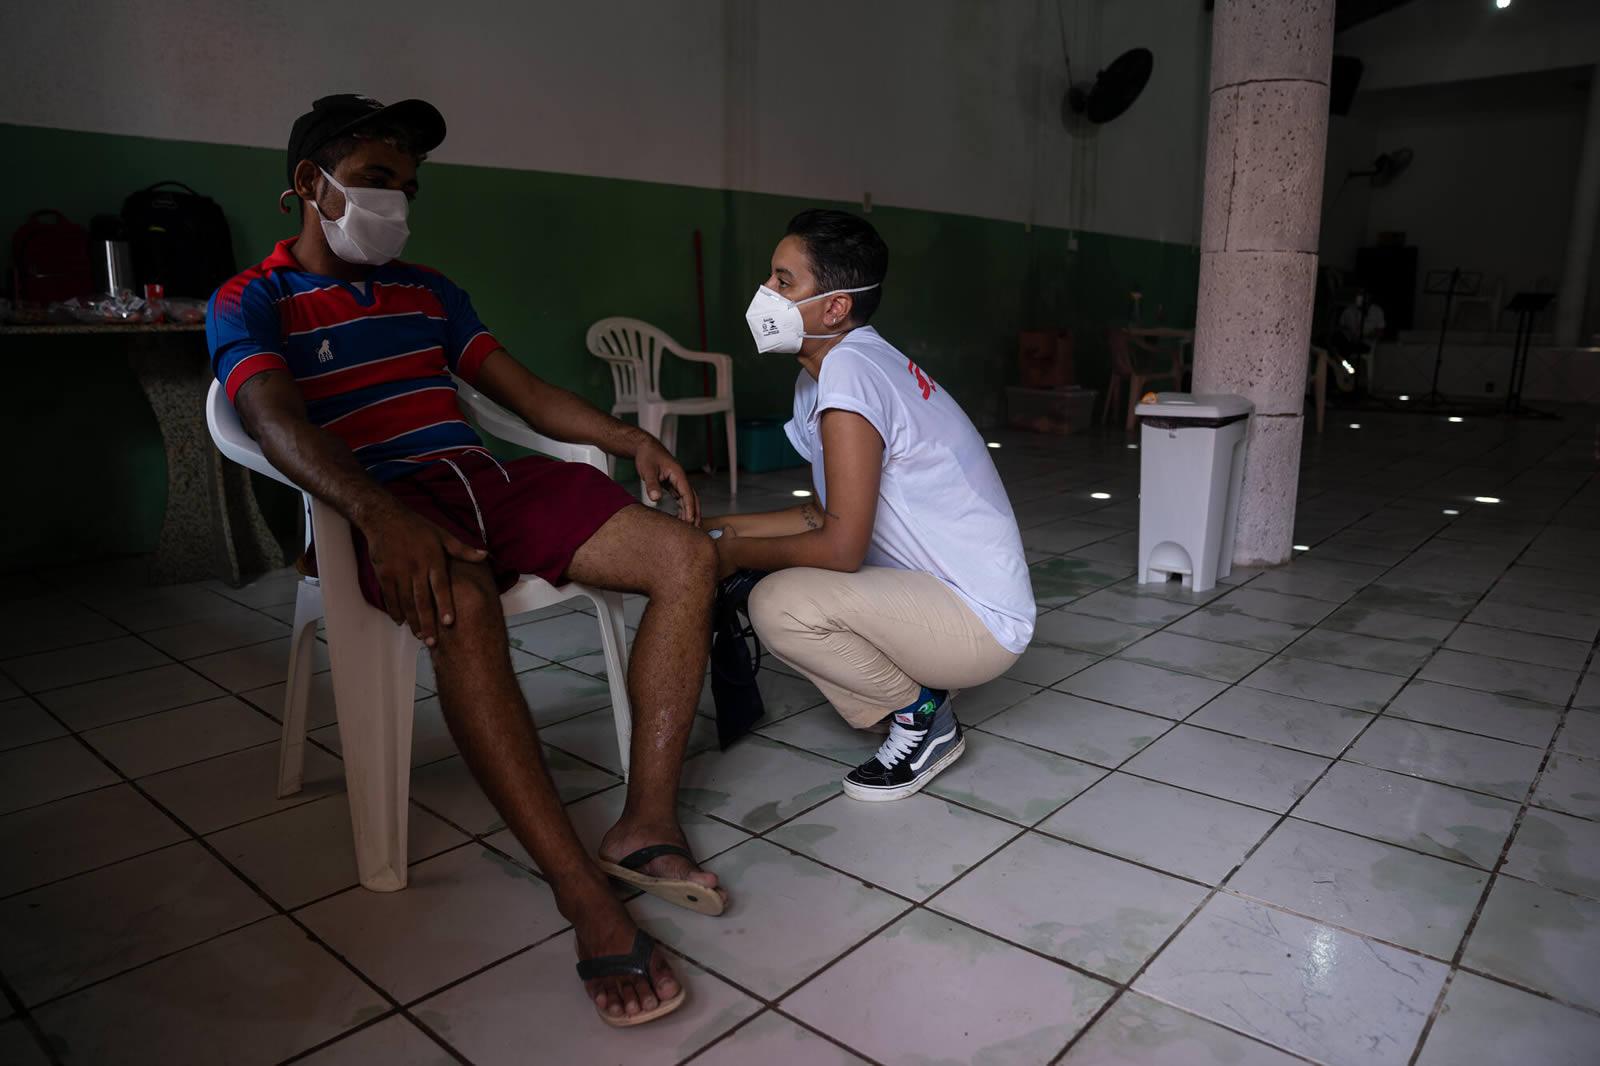 brazil-fortaleza-covid19-mobile-clinic-2.jpg